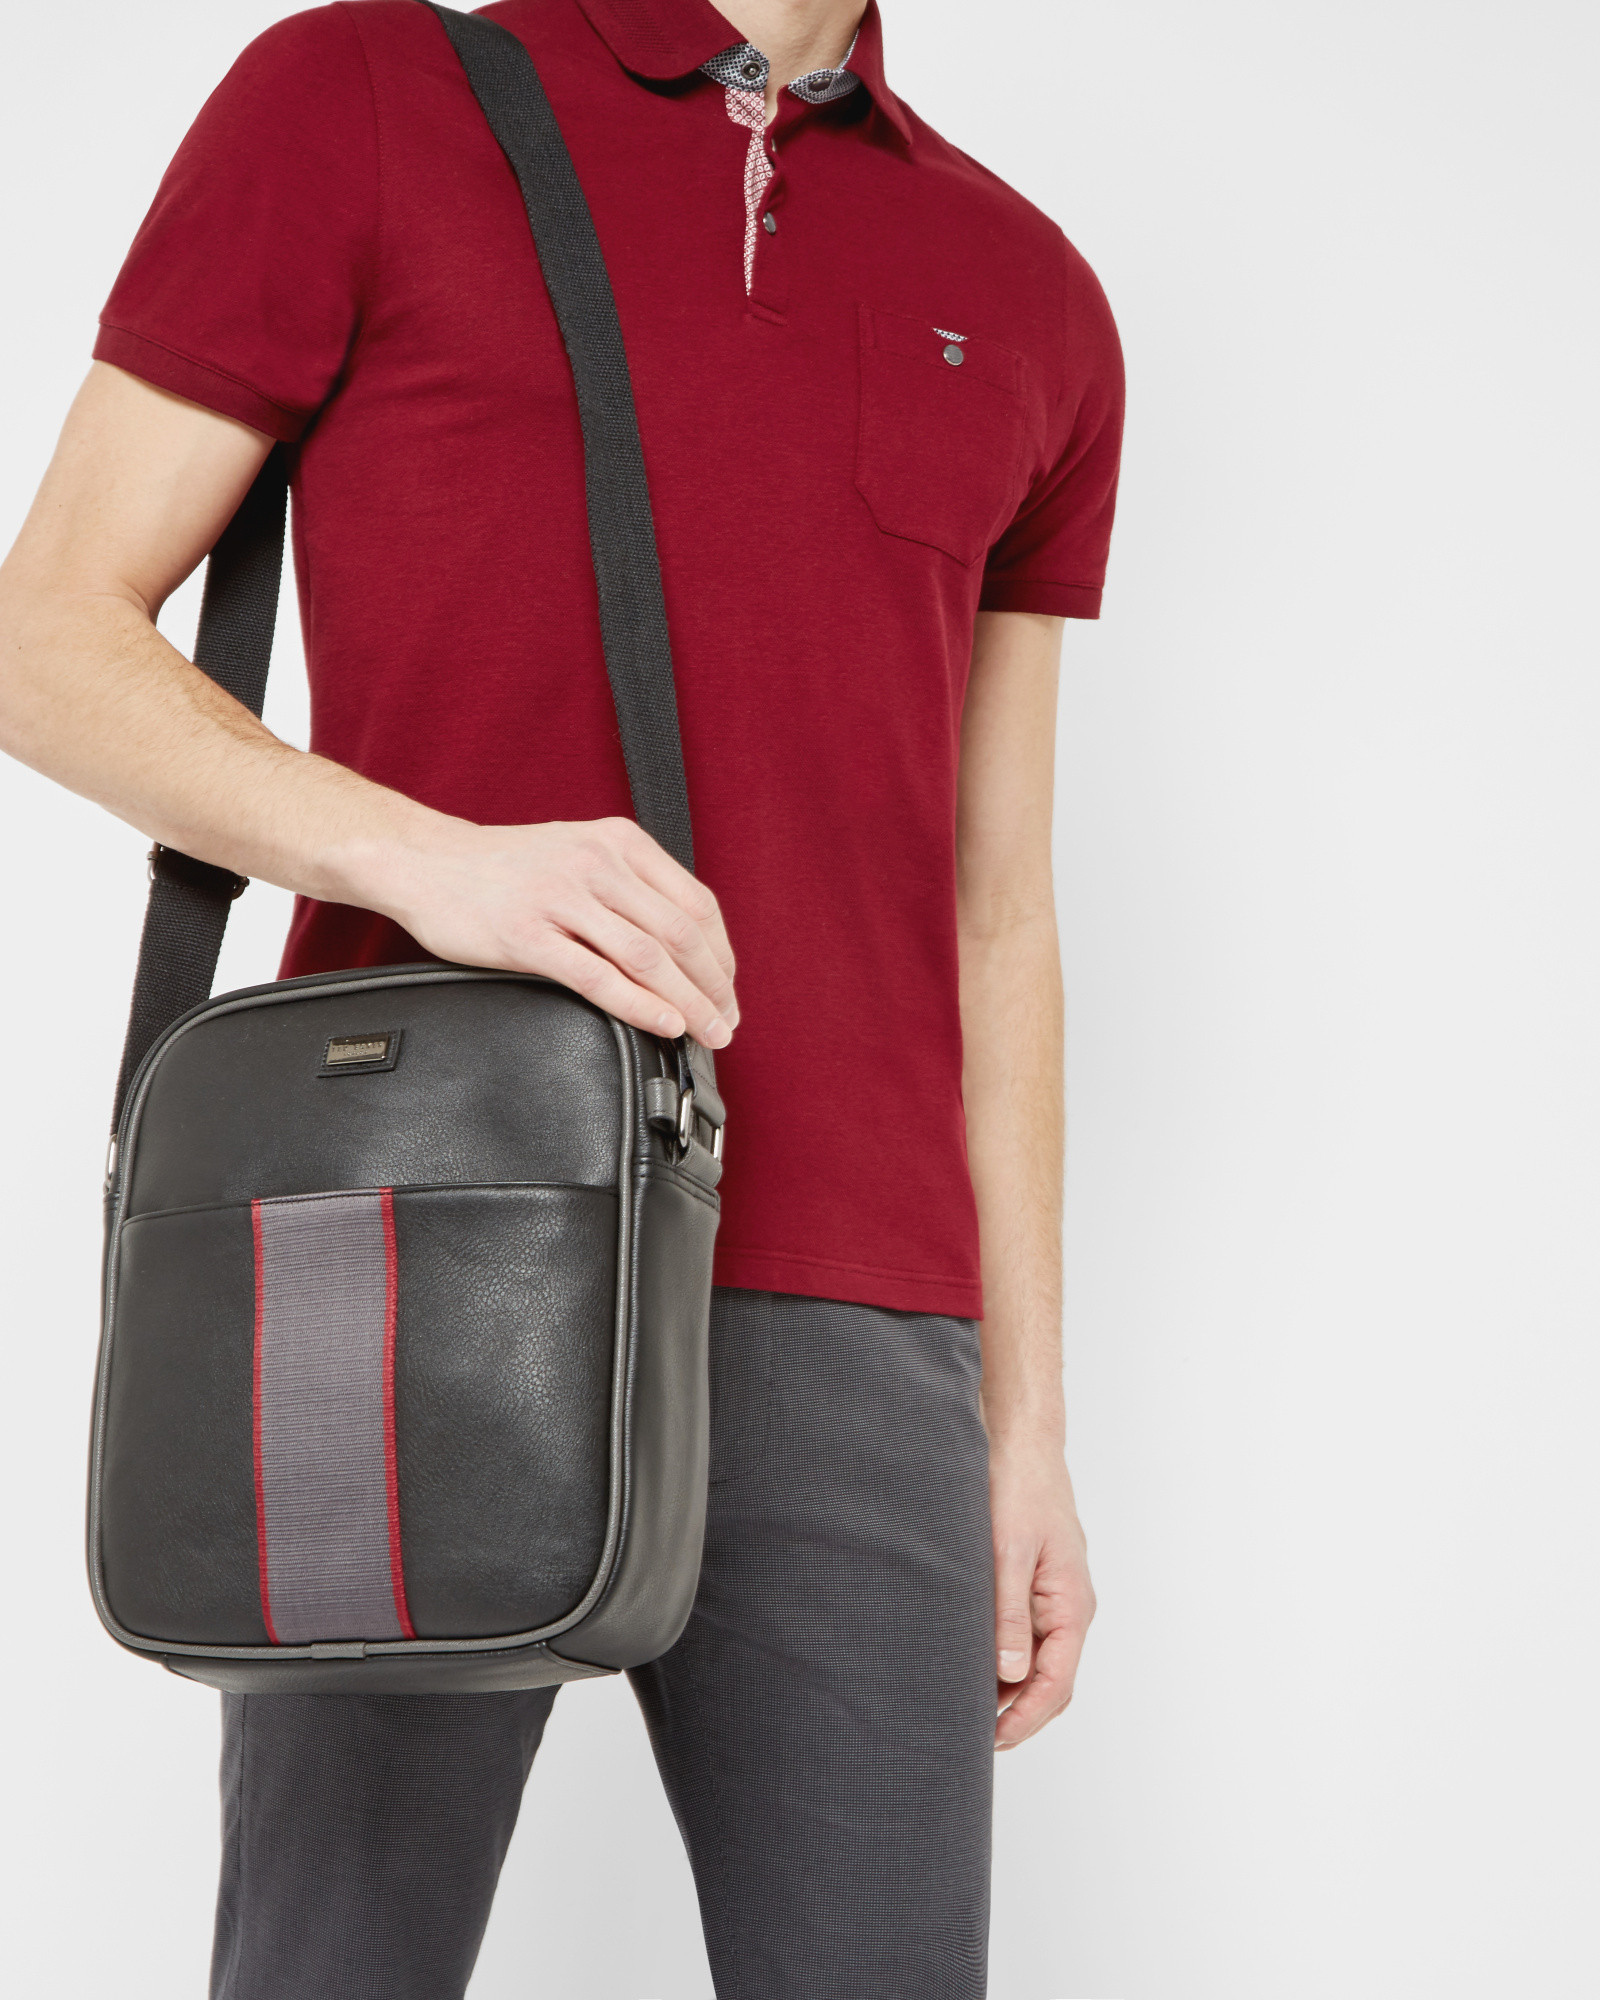 Ted Baker Striped Webbing Flight Bag in Black for Men - Lyst 1d675f727b8a4